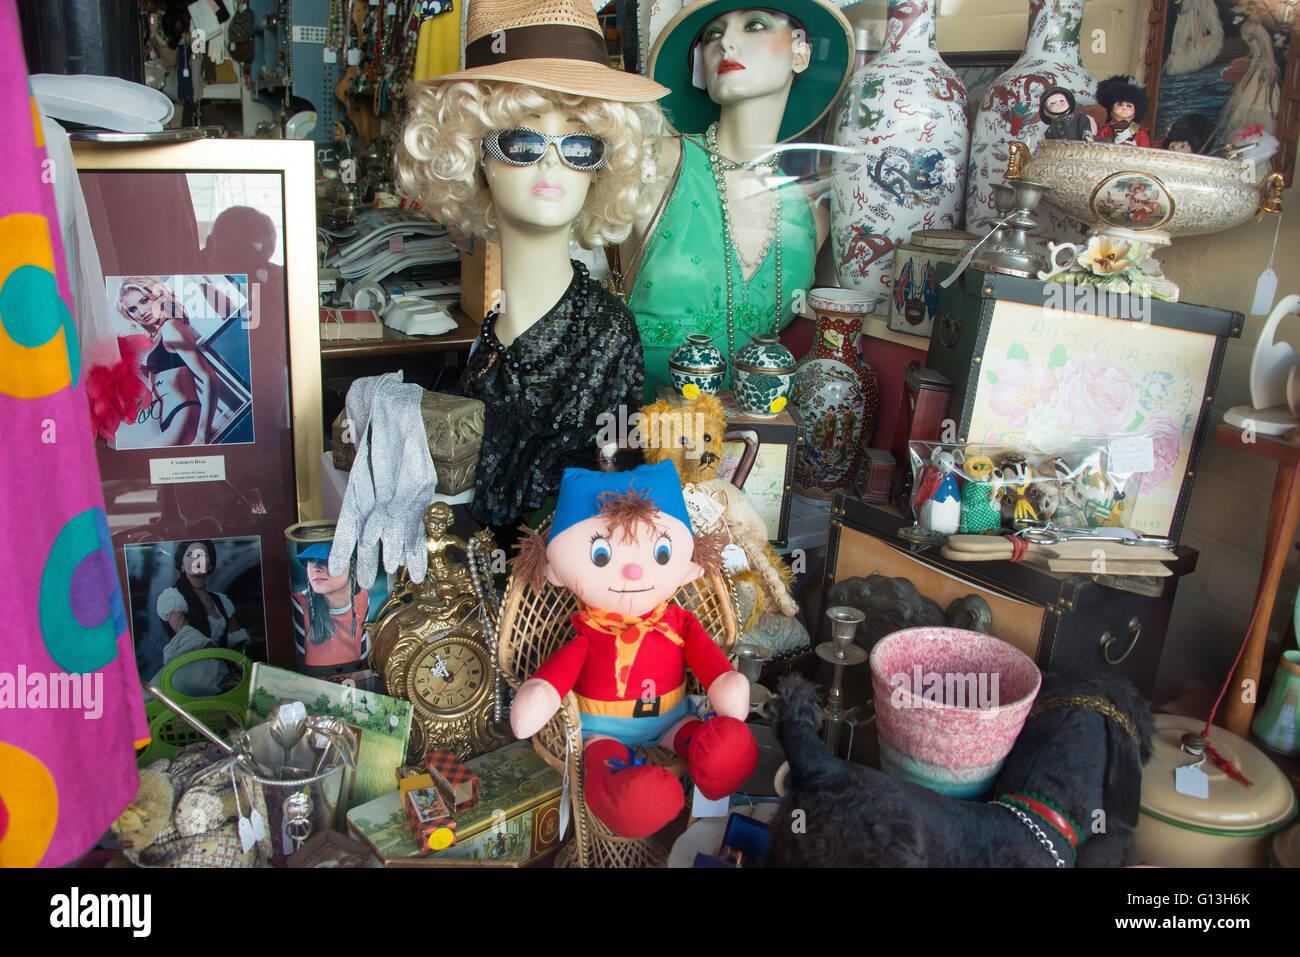 Antique shop window, King Street, Newtown, Sydney, New South Wales, Australia - Stock Image